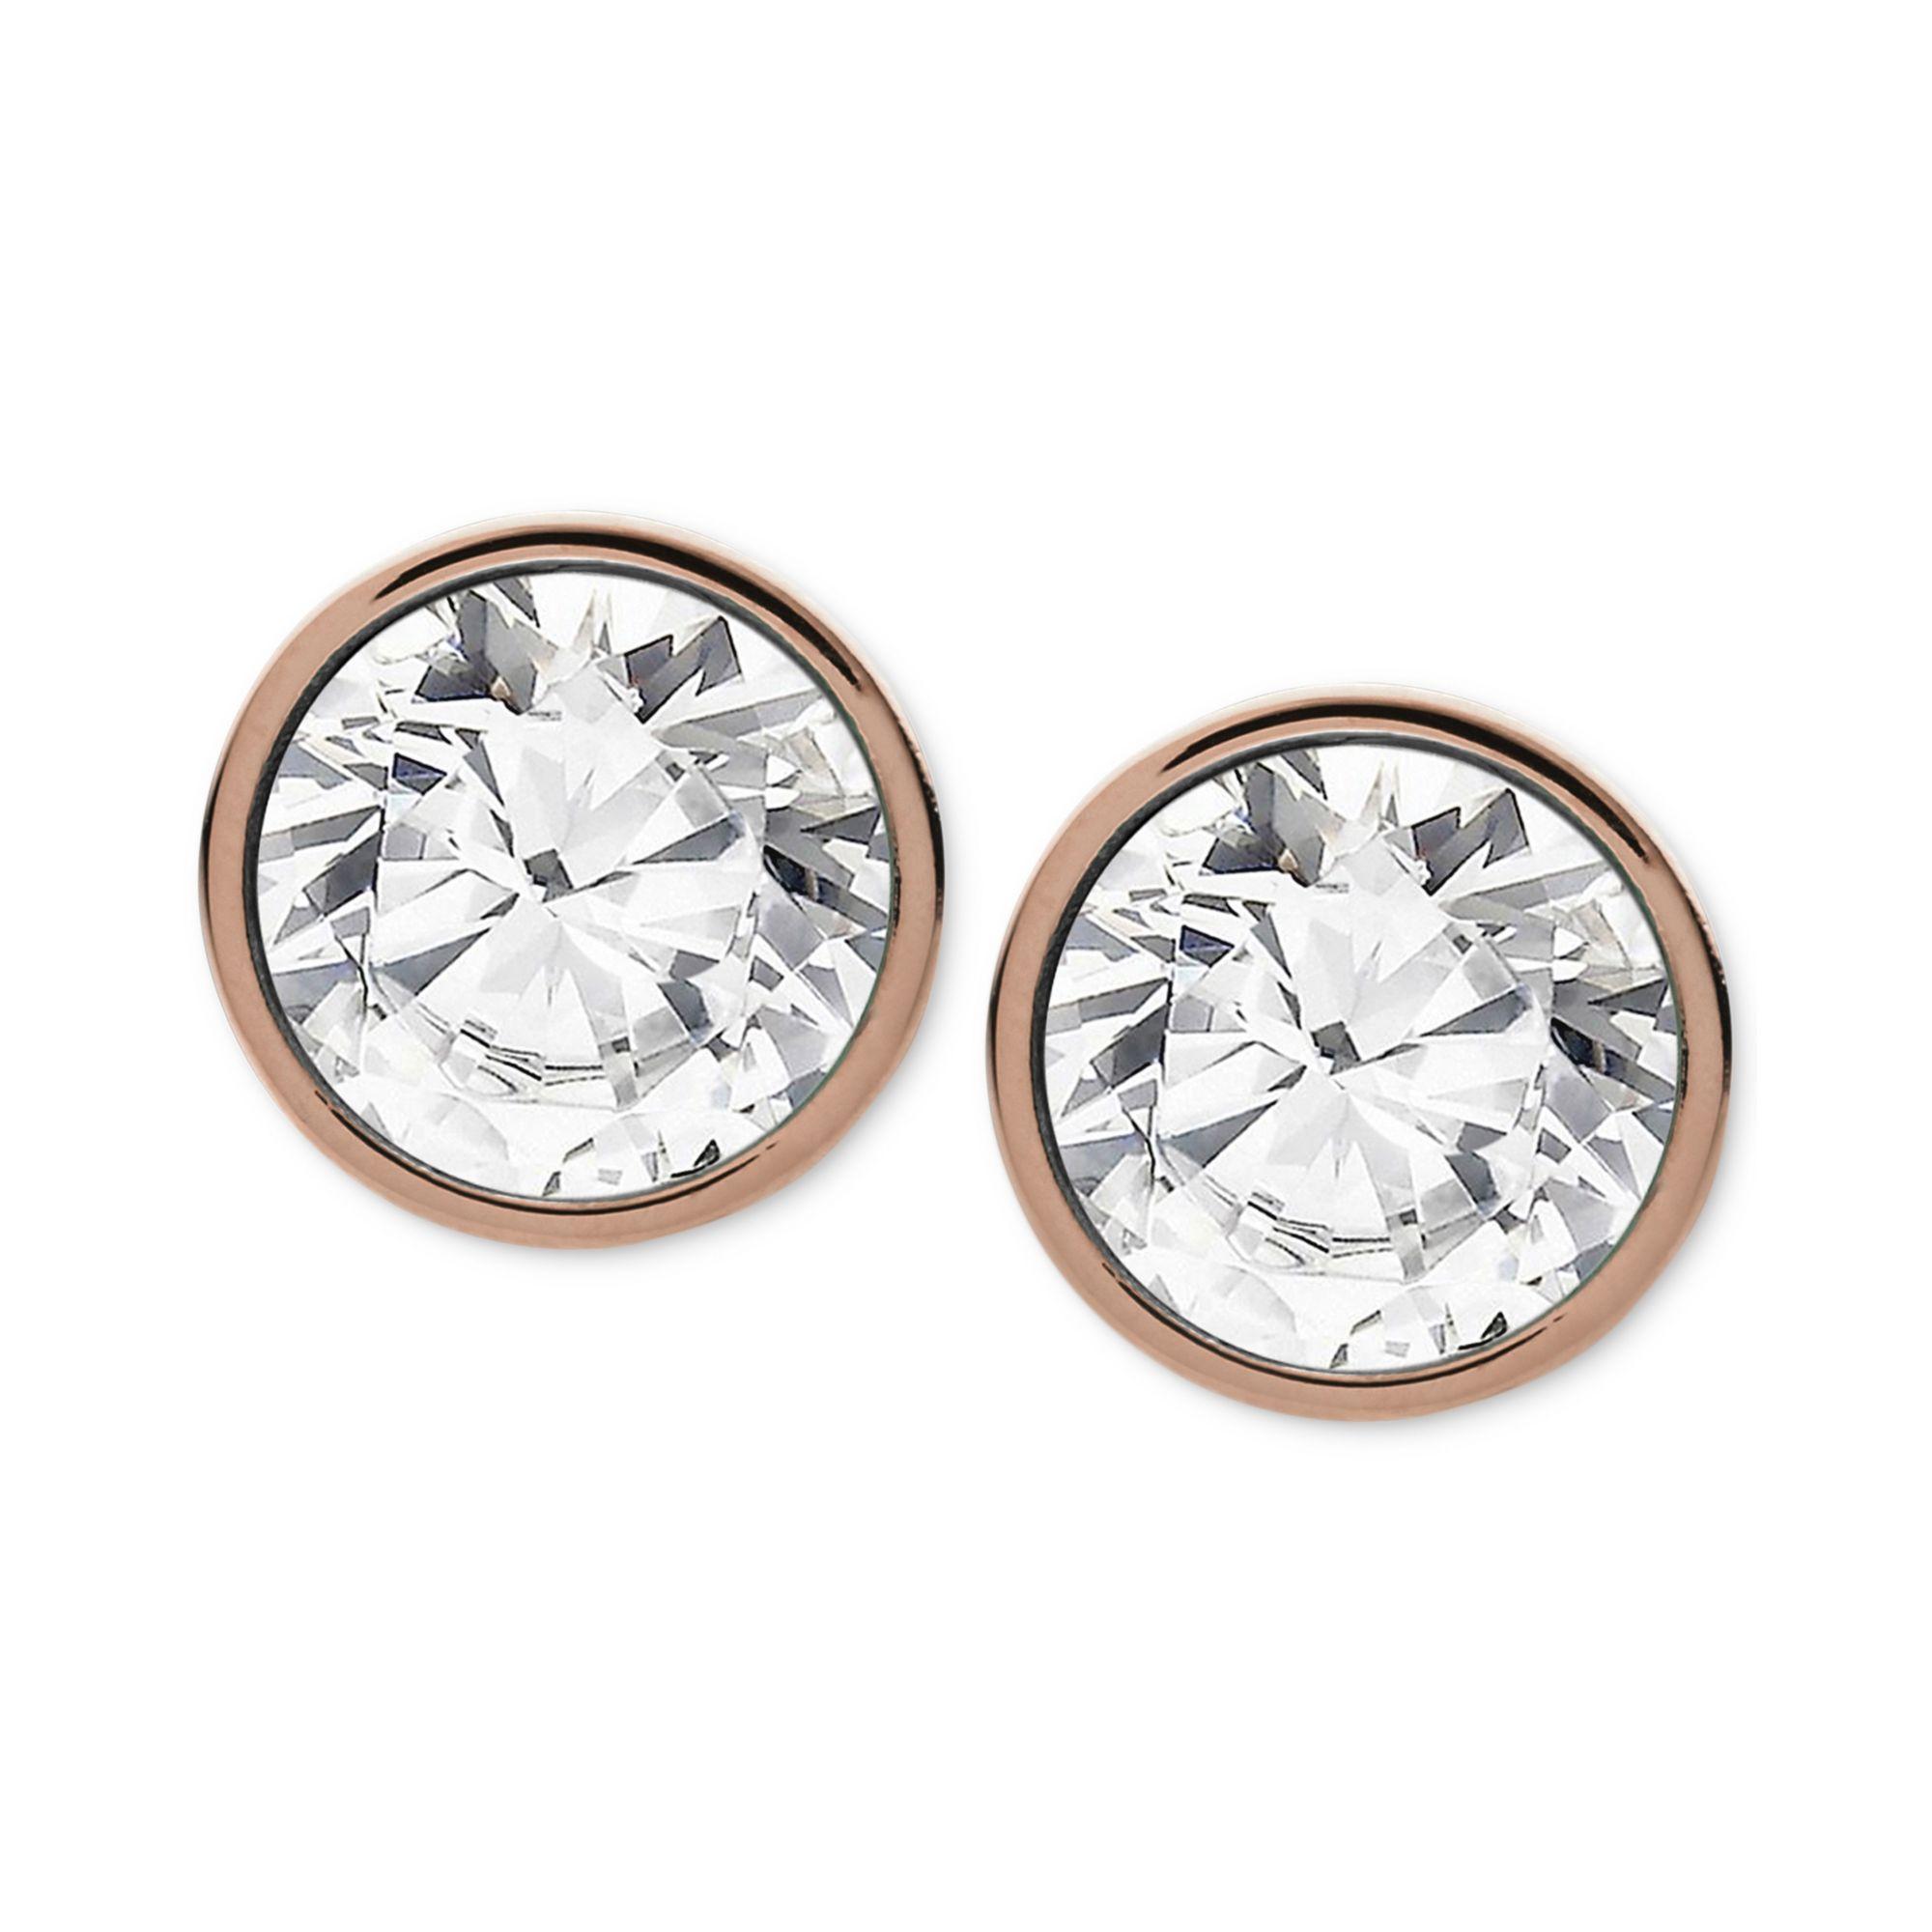 michael kors stud earrings macys mksale